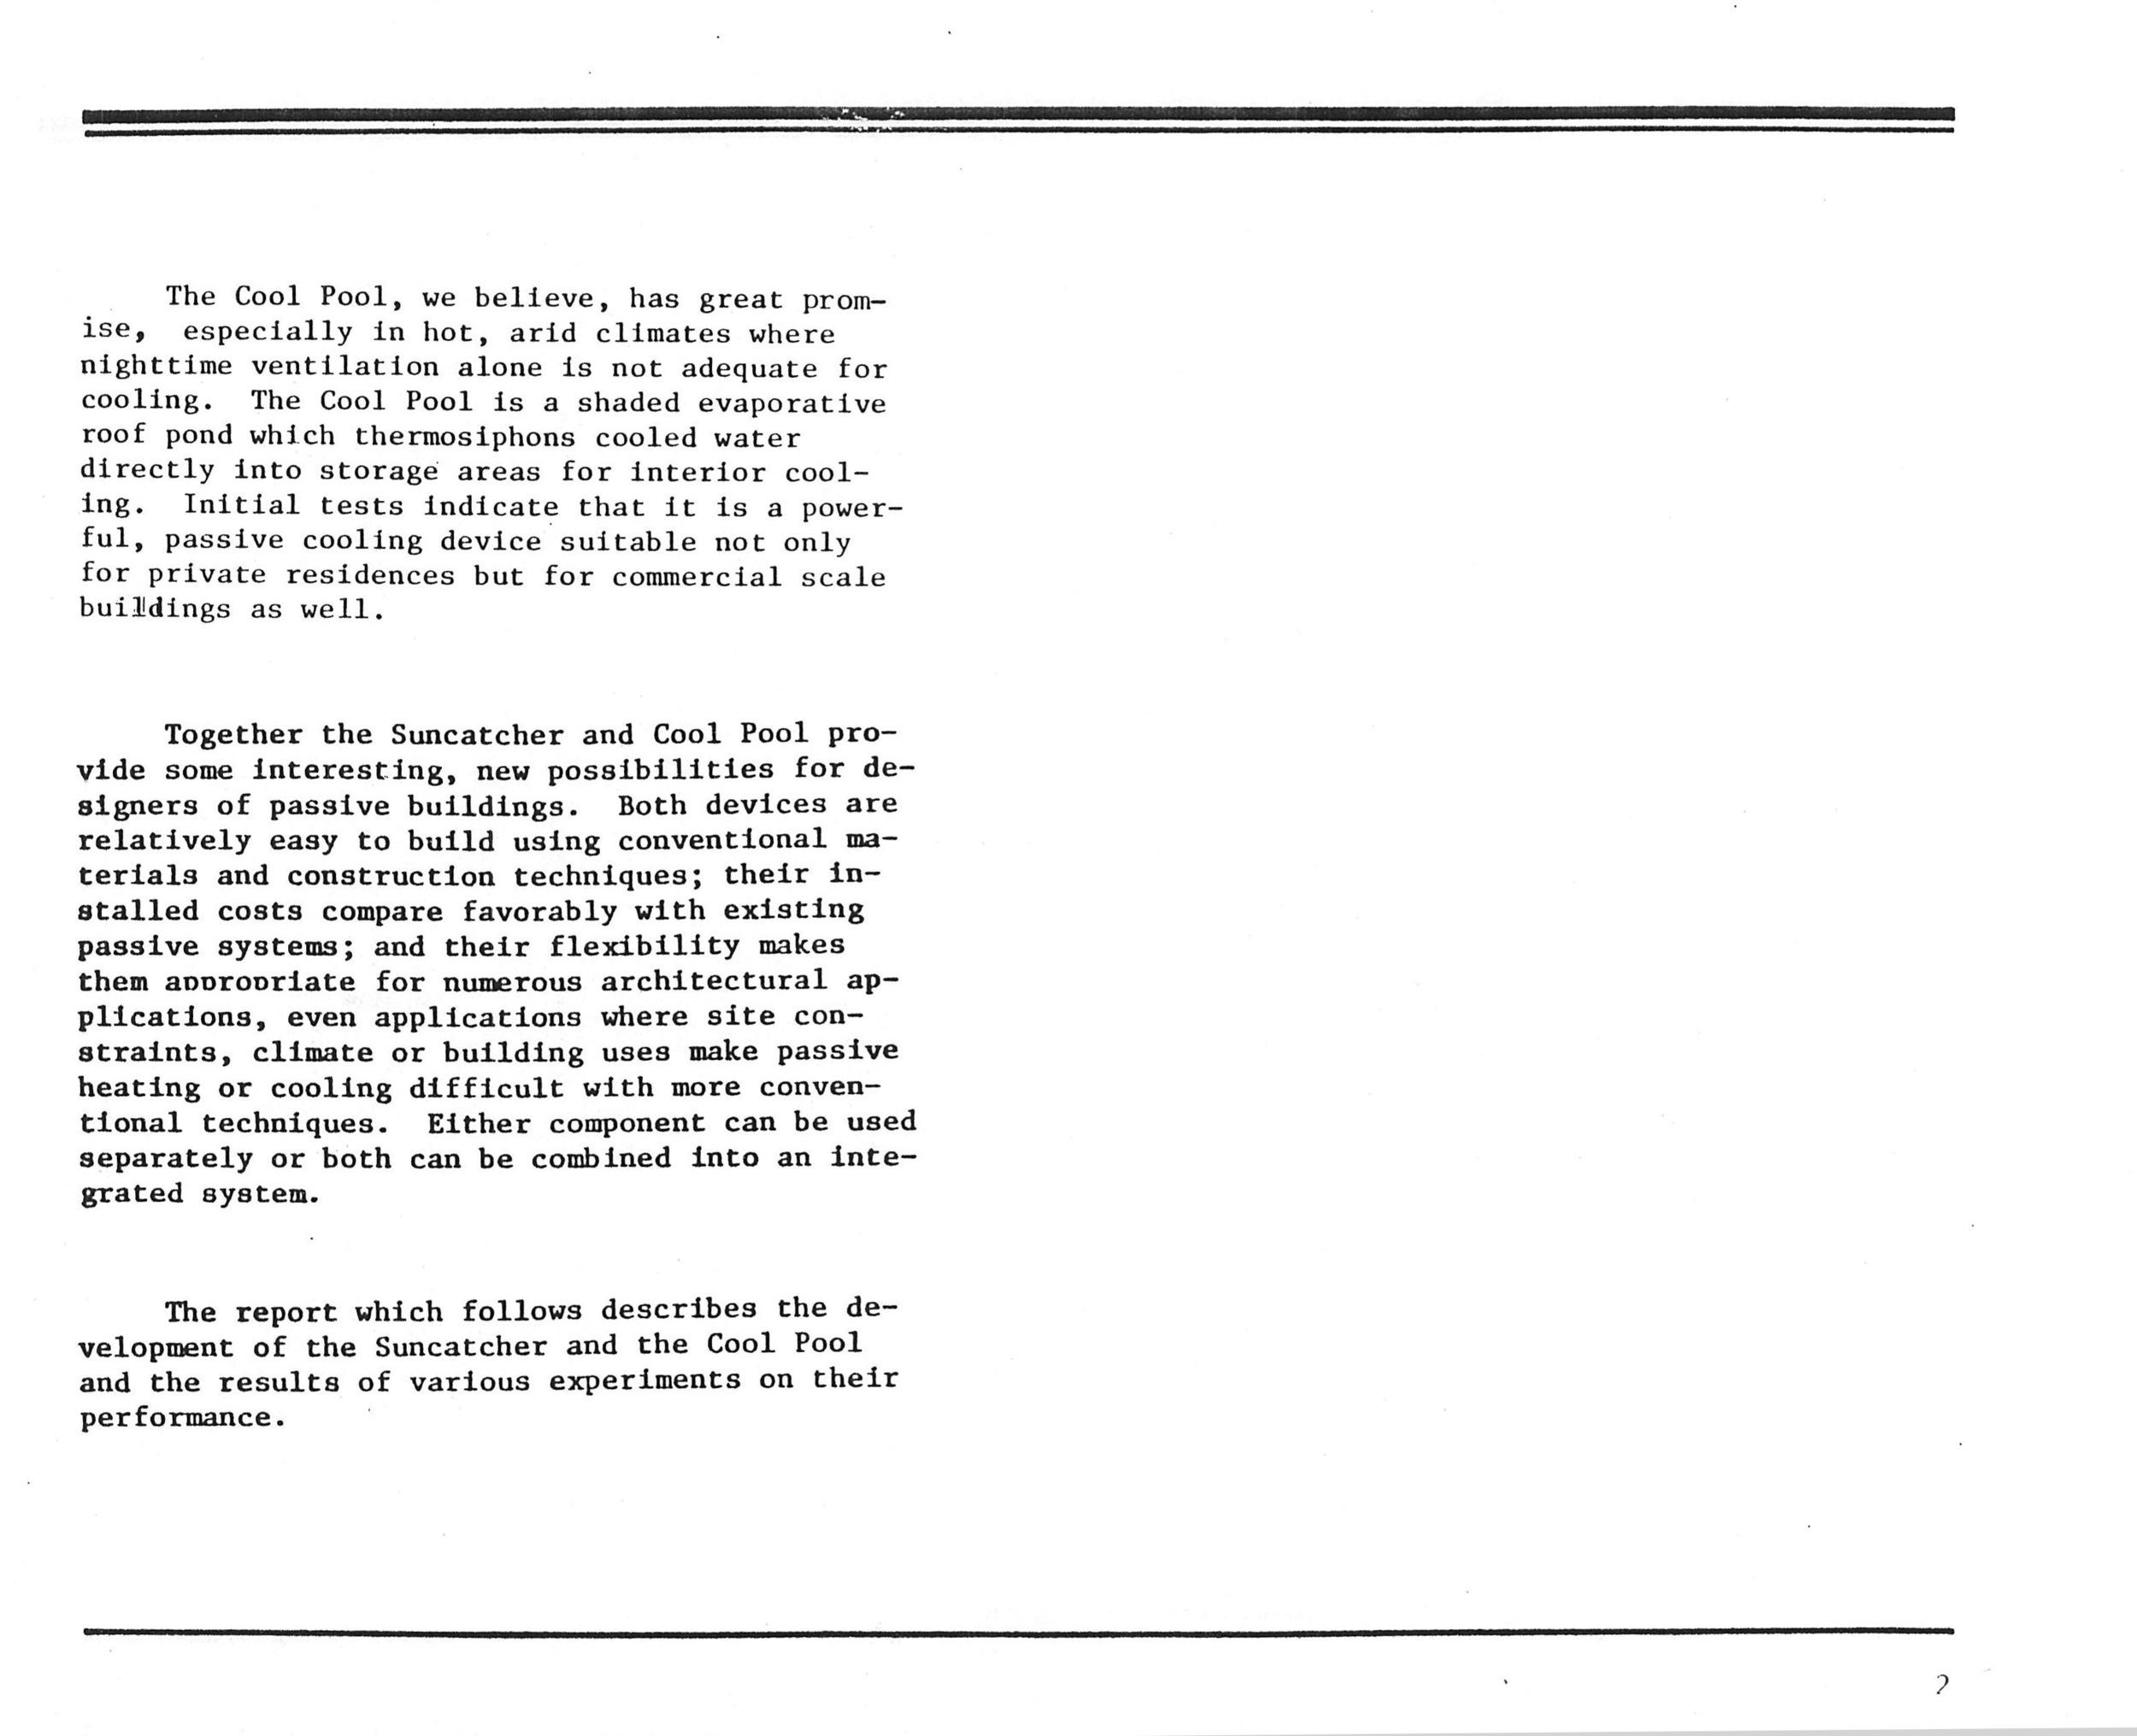 CoolPool-LivingSystems_1981_Page_006.jpg